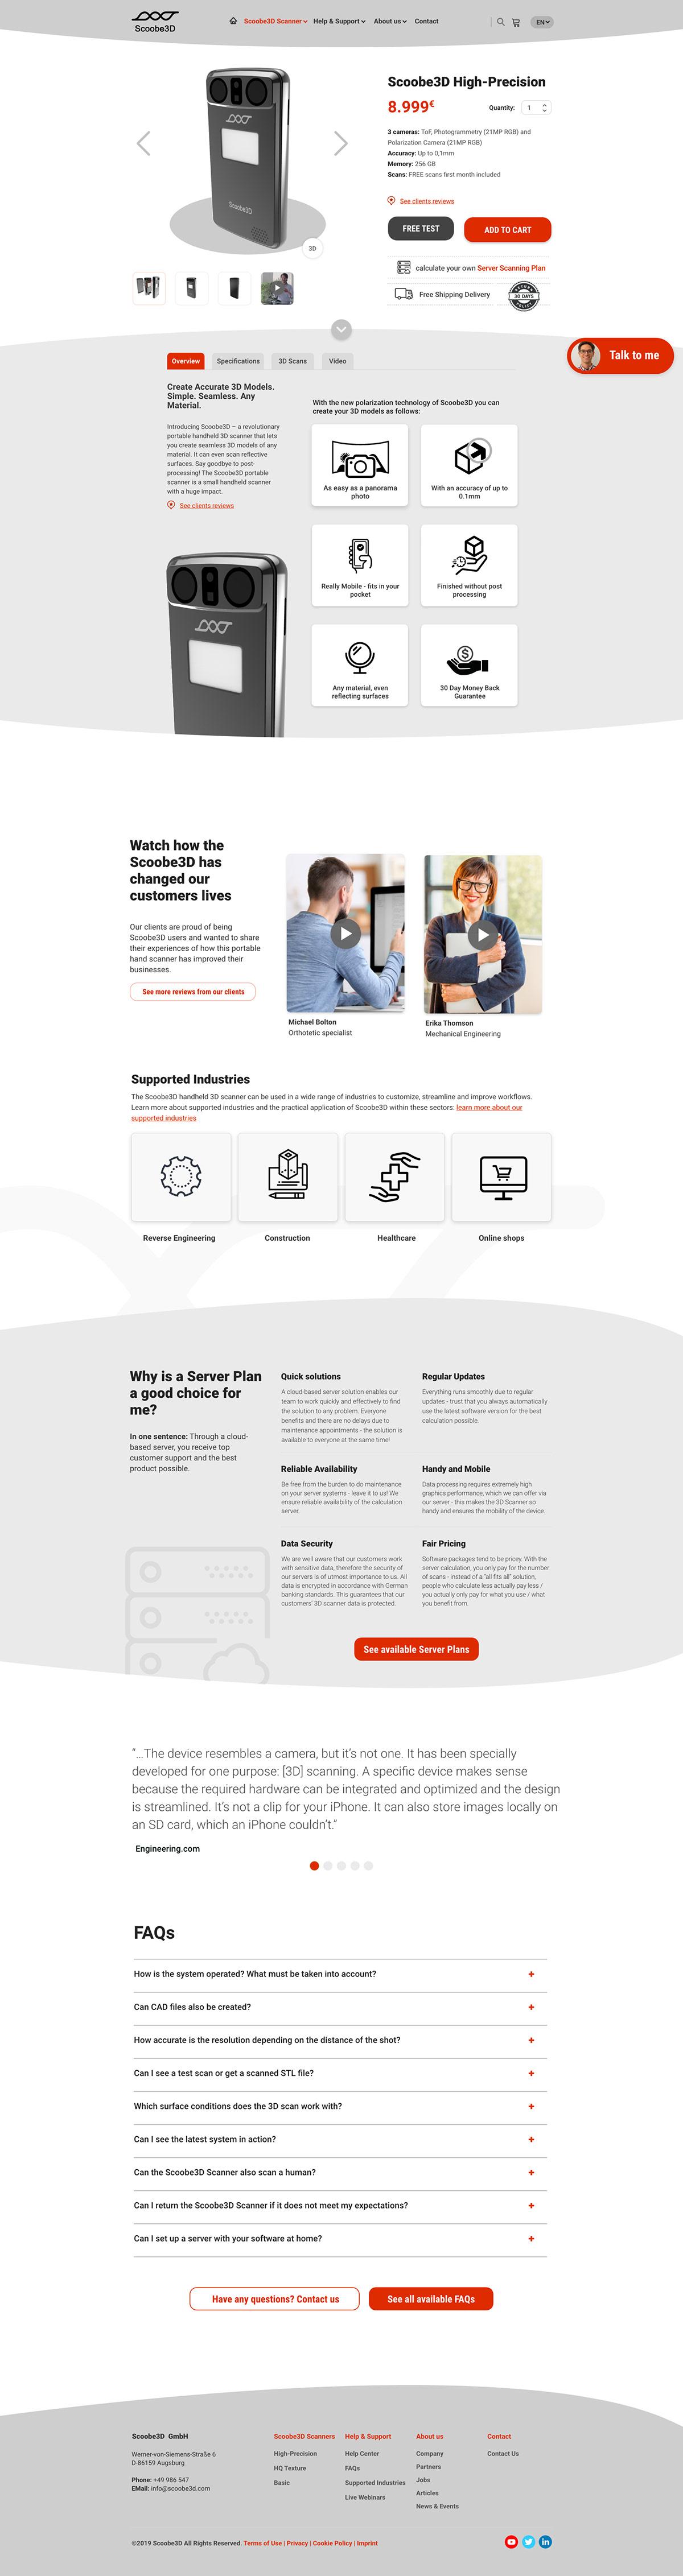 heatmaps analysis User research user testing ux/ui website redesign